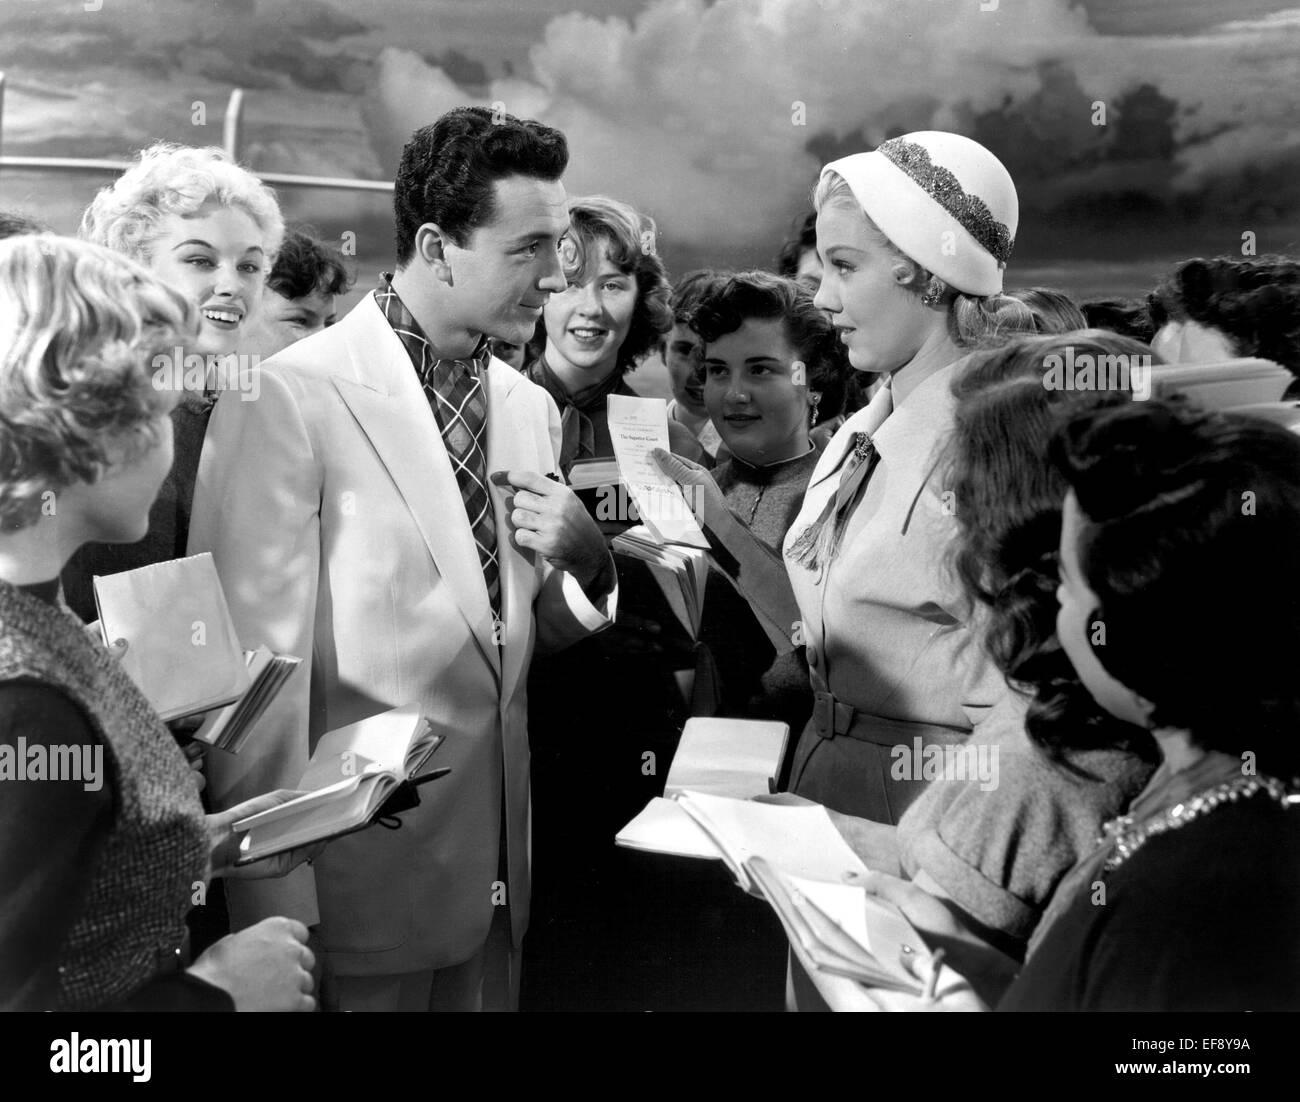 VIC DAMONE & JANE POWELL ATHENA (1954) - Stock Image